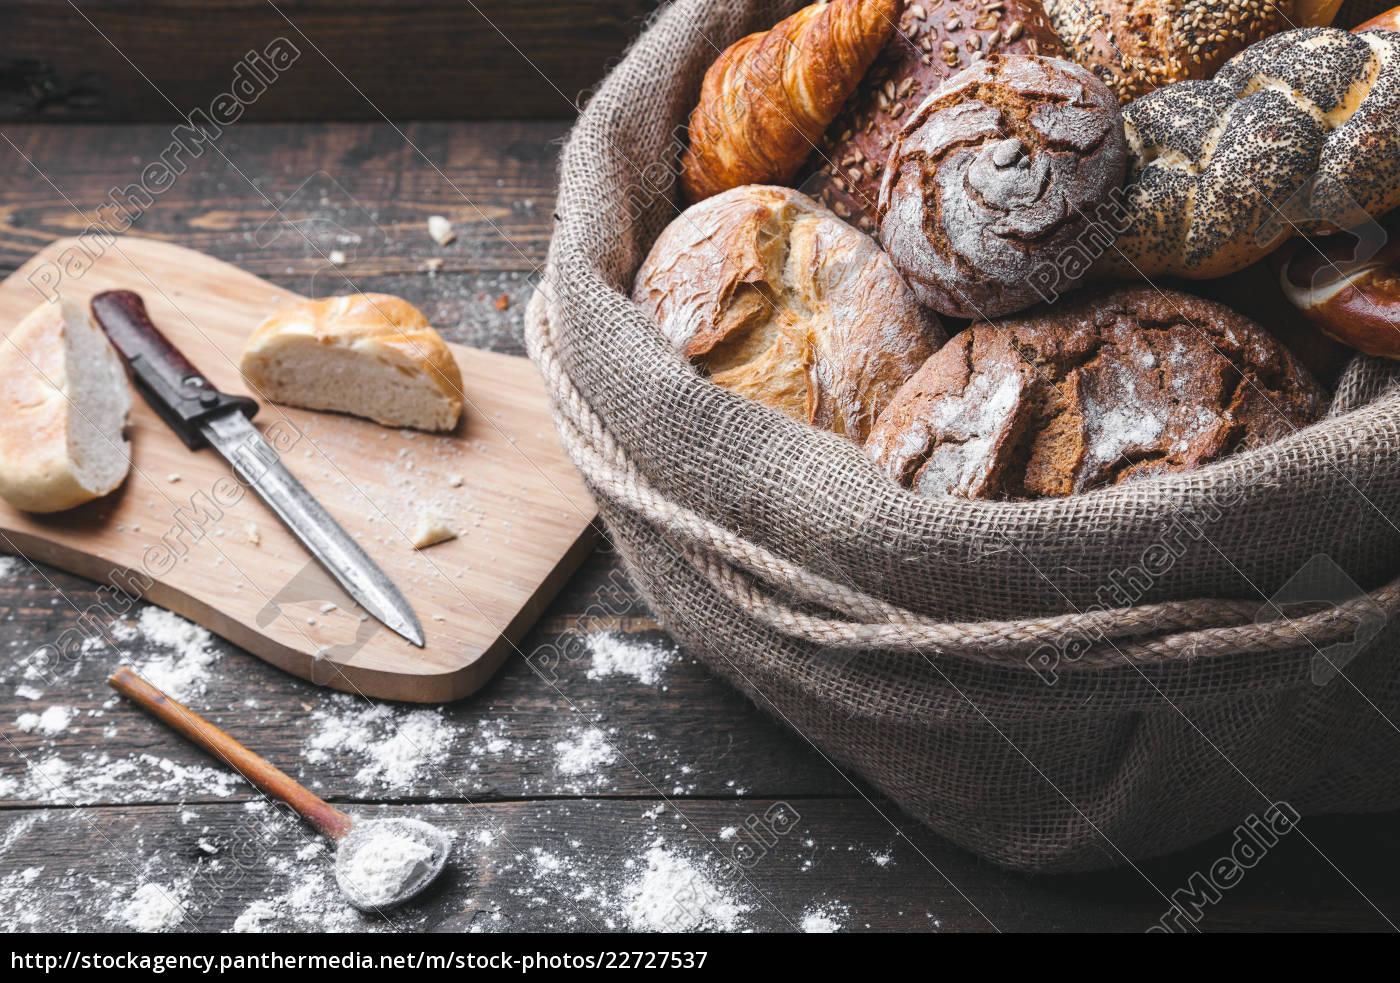 delicious, fresh, bread, inside, a, sack - 22727537